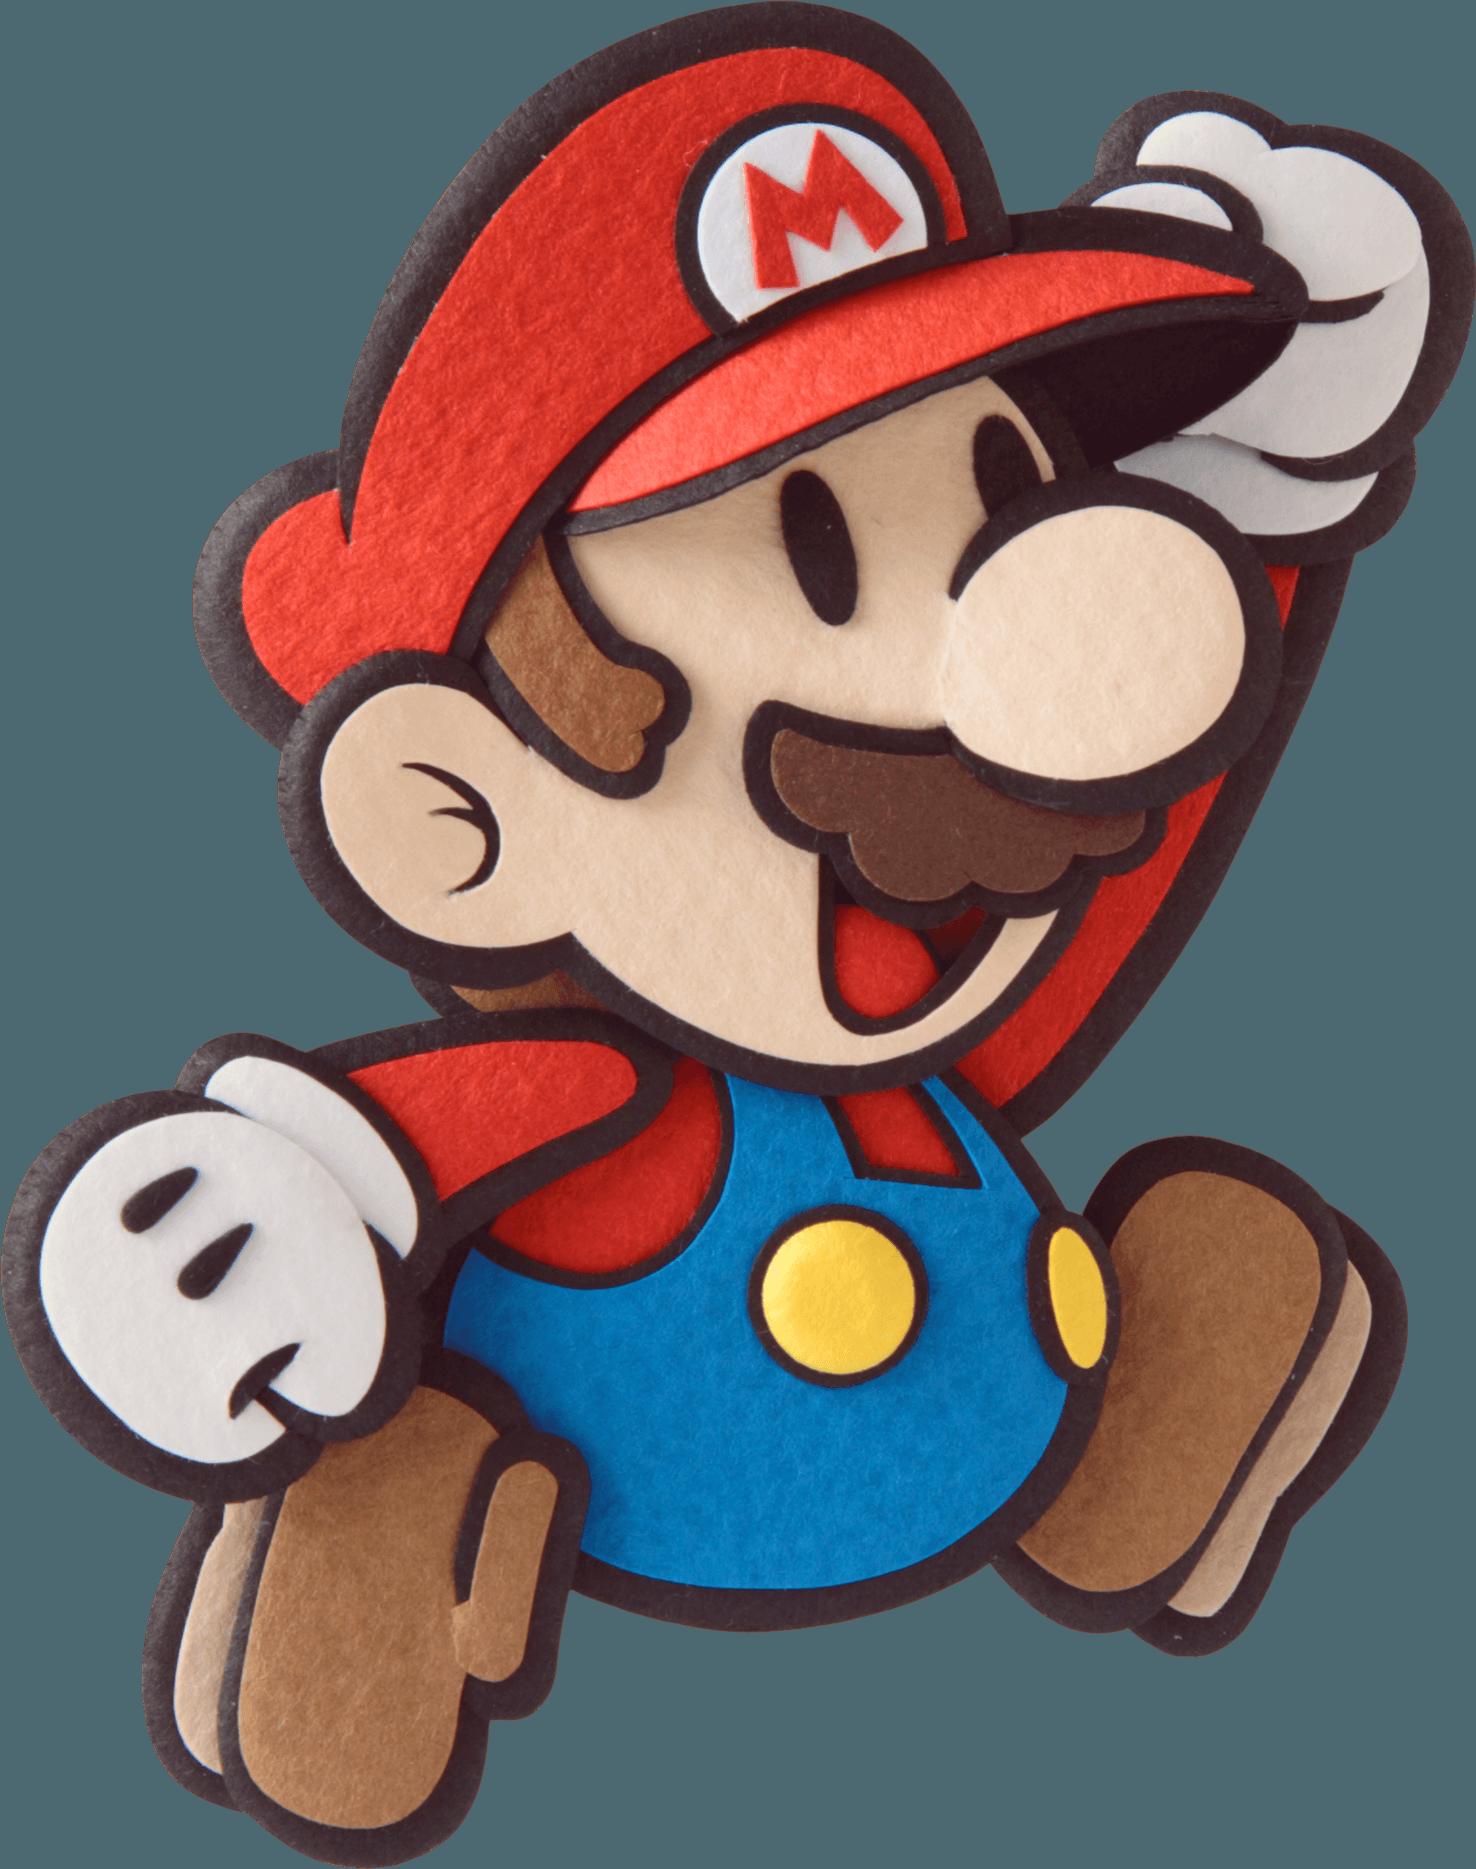 Paper Mario Sticker Star Blue Toad